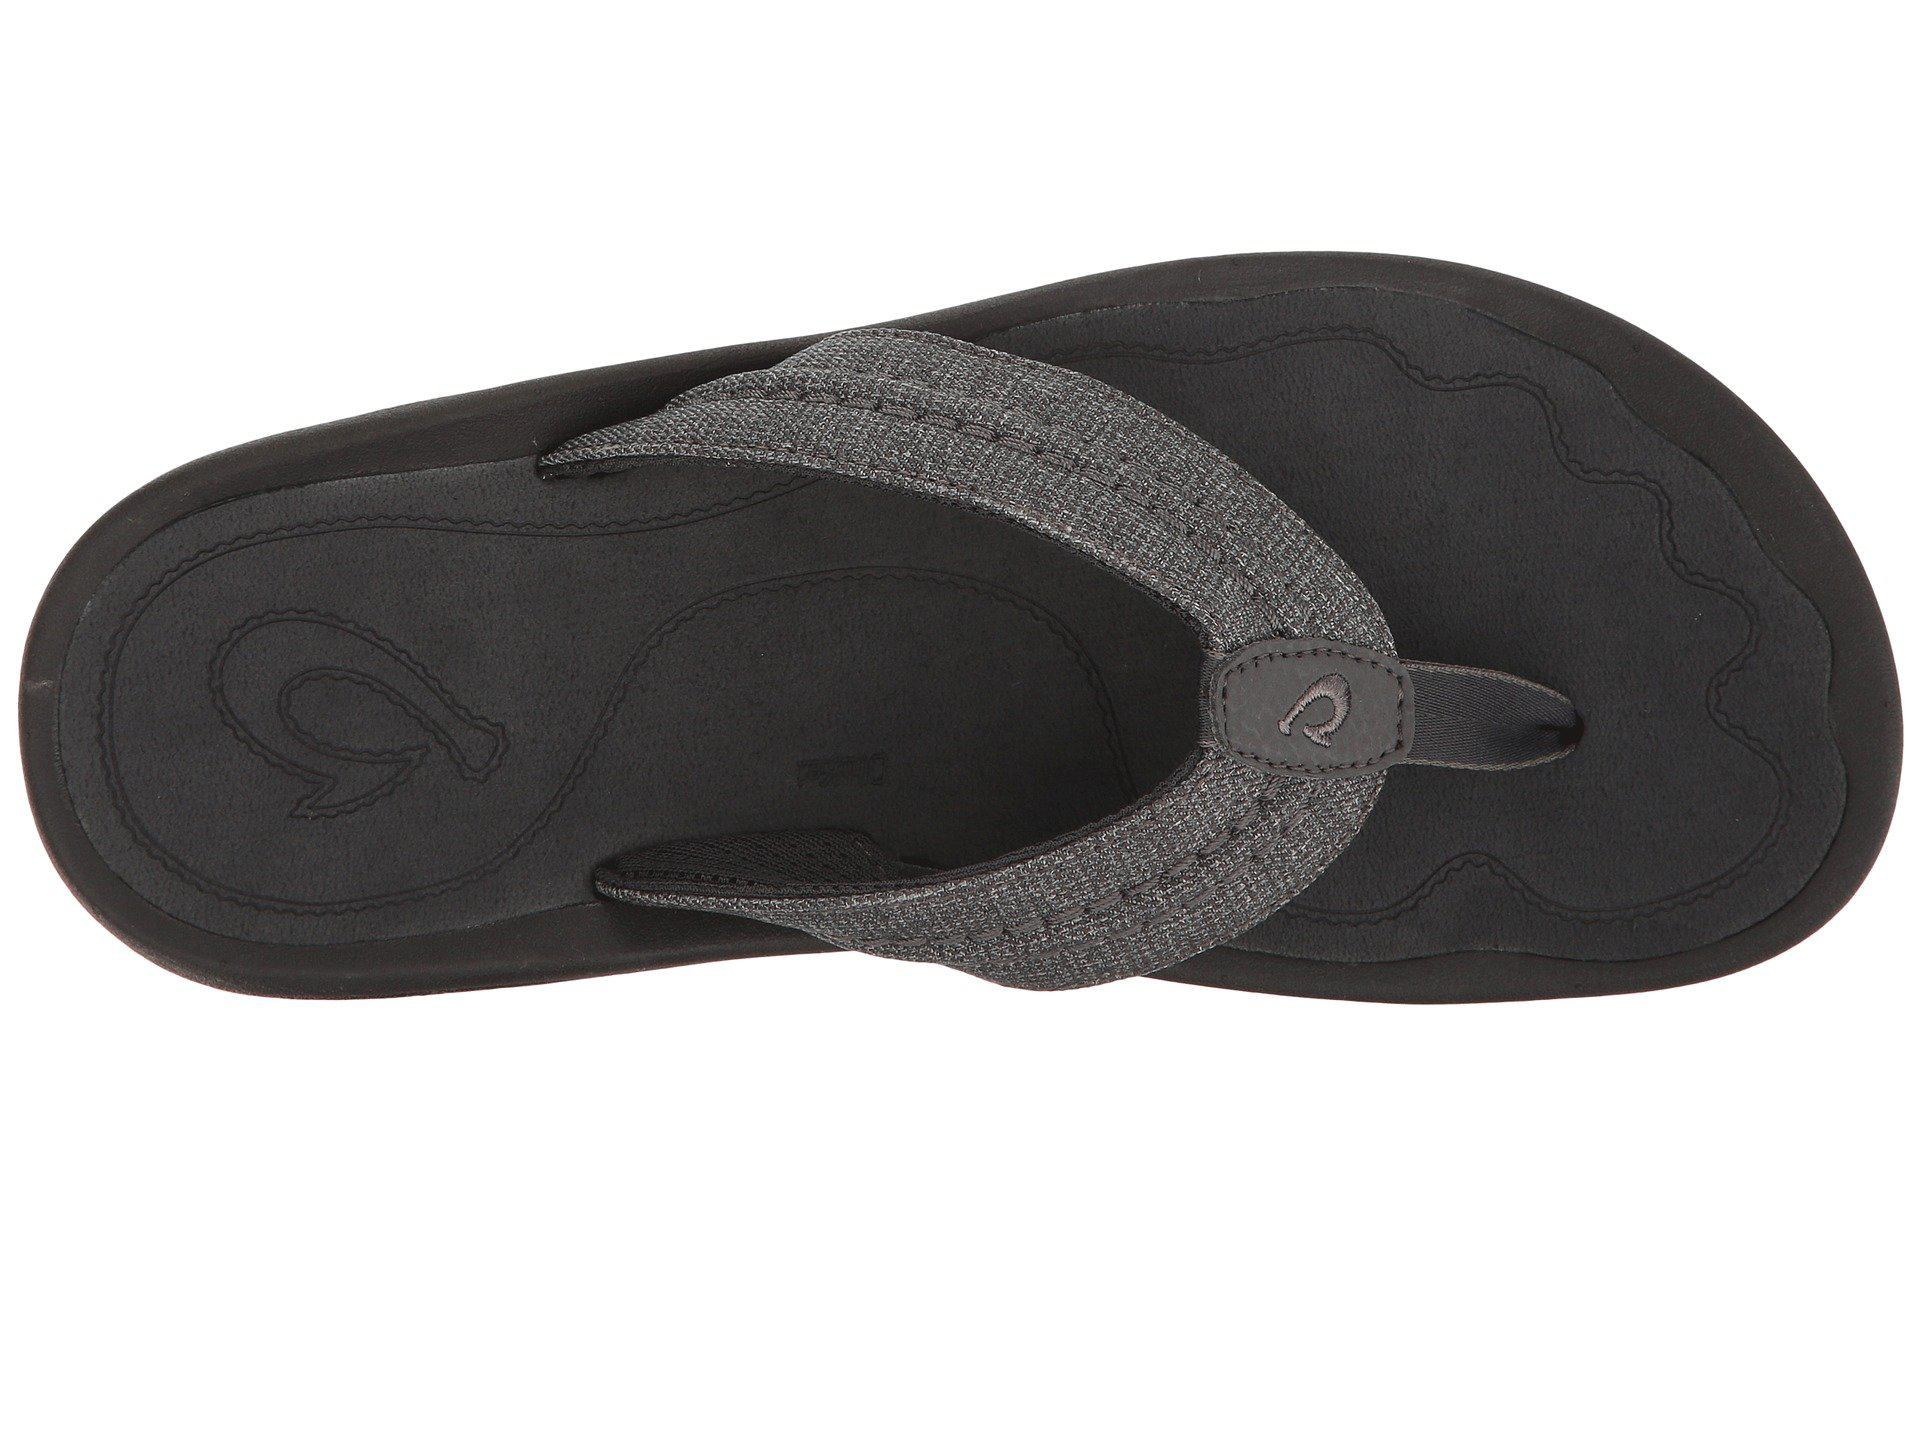 bcce8c3dc96d Lyst - Olukai Hokua Mesh (night dark Shadow) Men s Sandals in Black ...